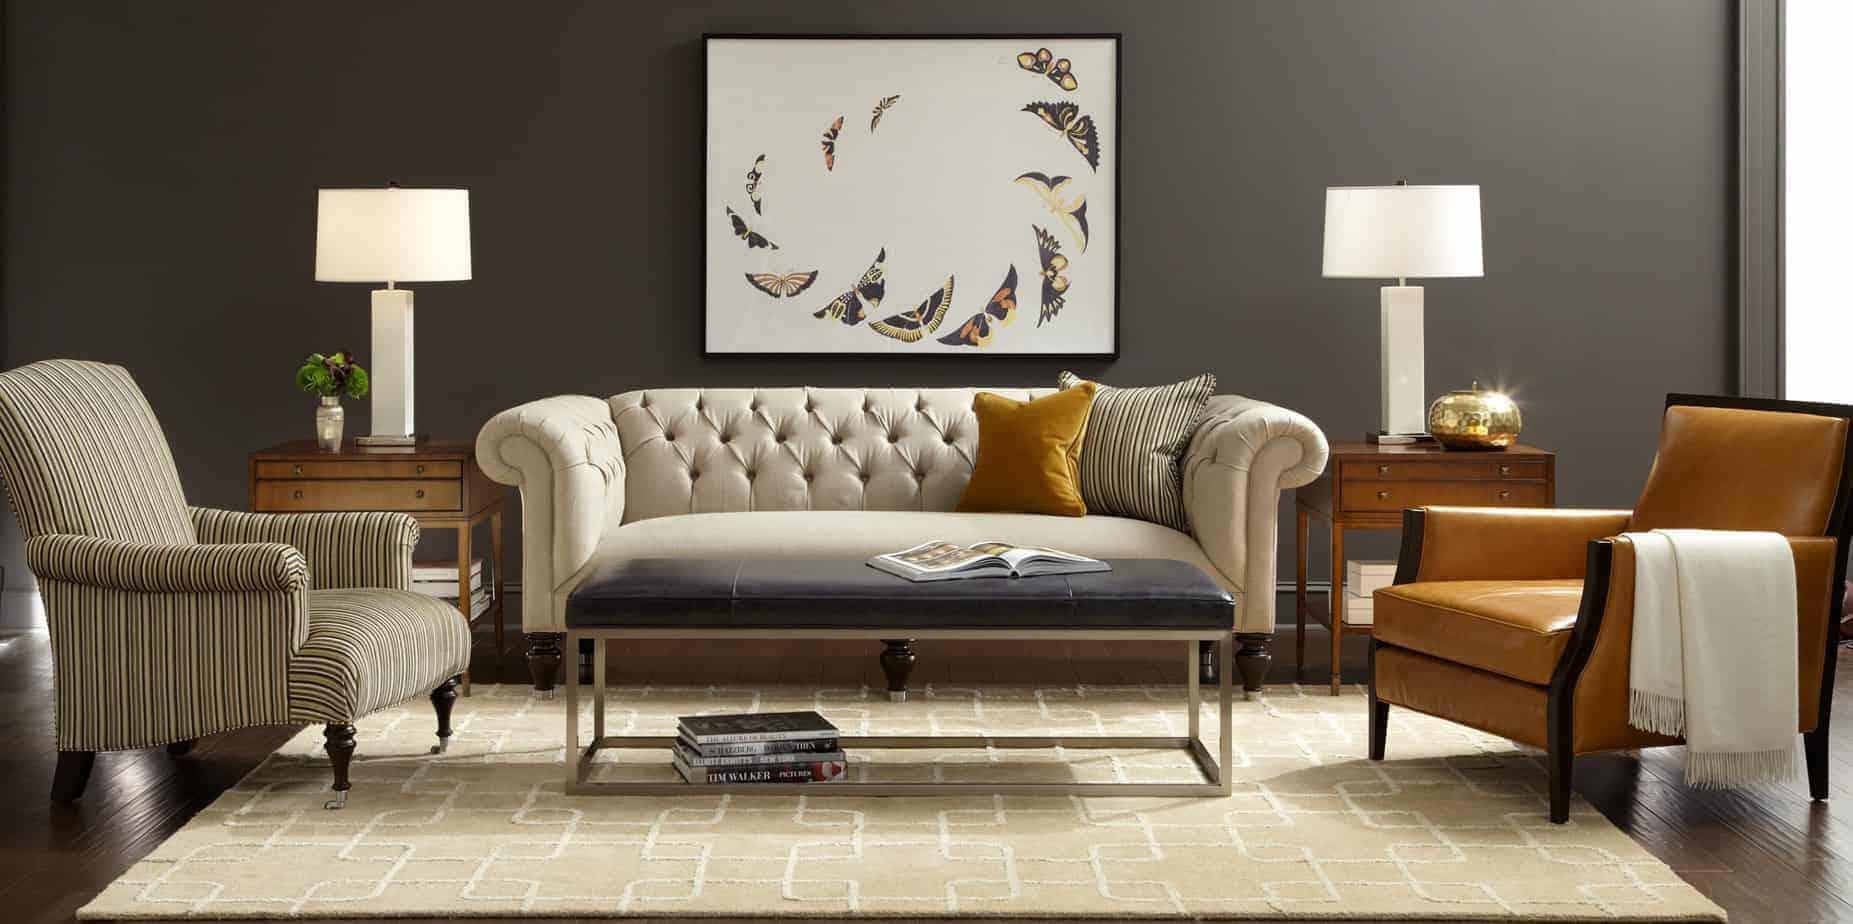 15 Furniture Stores In Nashville